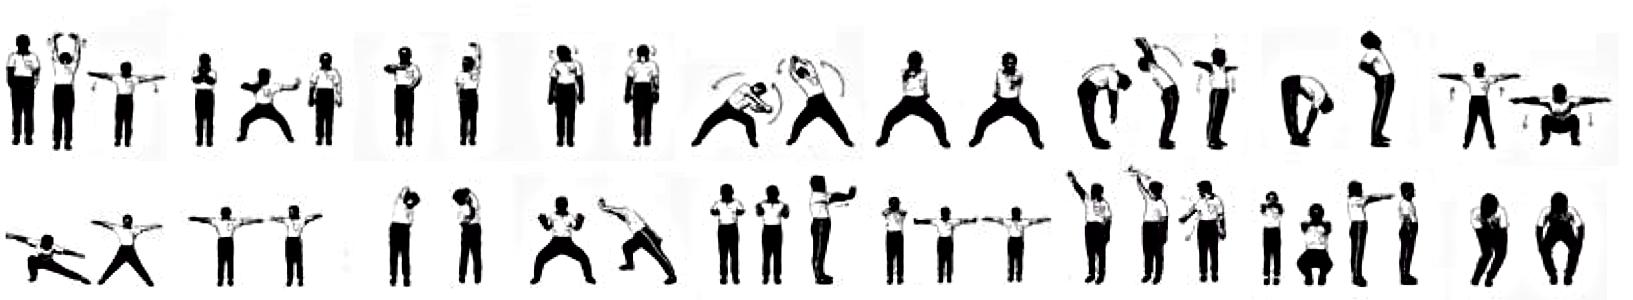 18 Lohan Hands Exercises